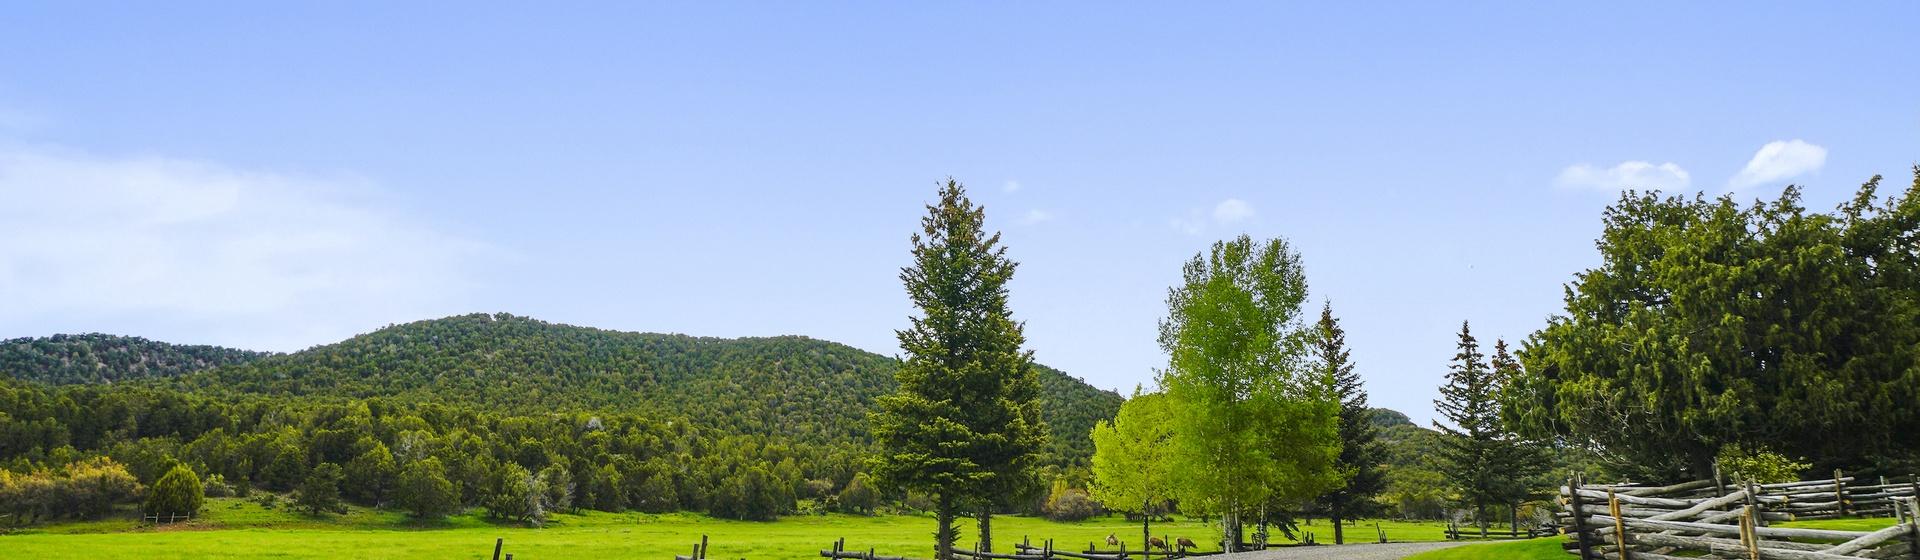 13.4-Telluride-Sleeping-Indian-Ranch-driveway-3-web.JPG